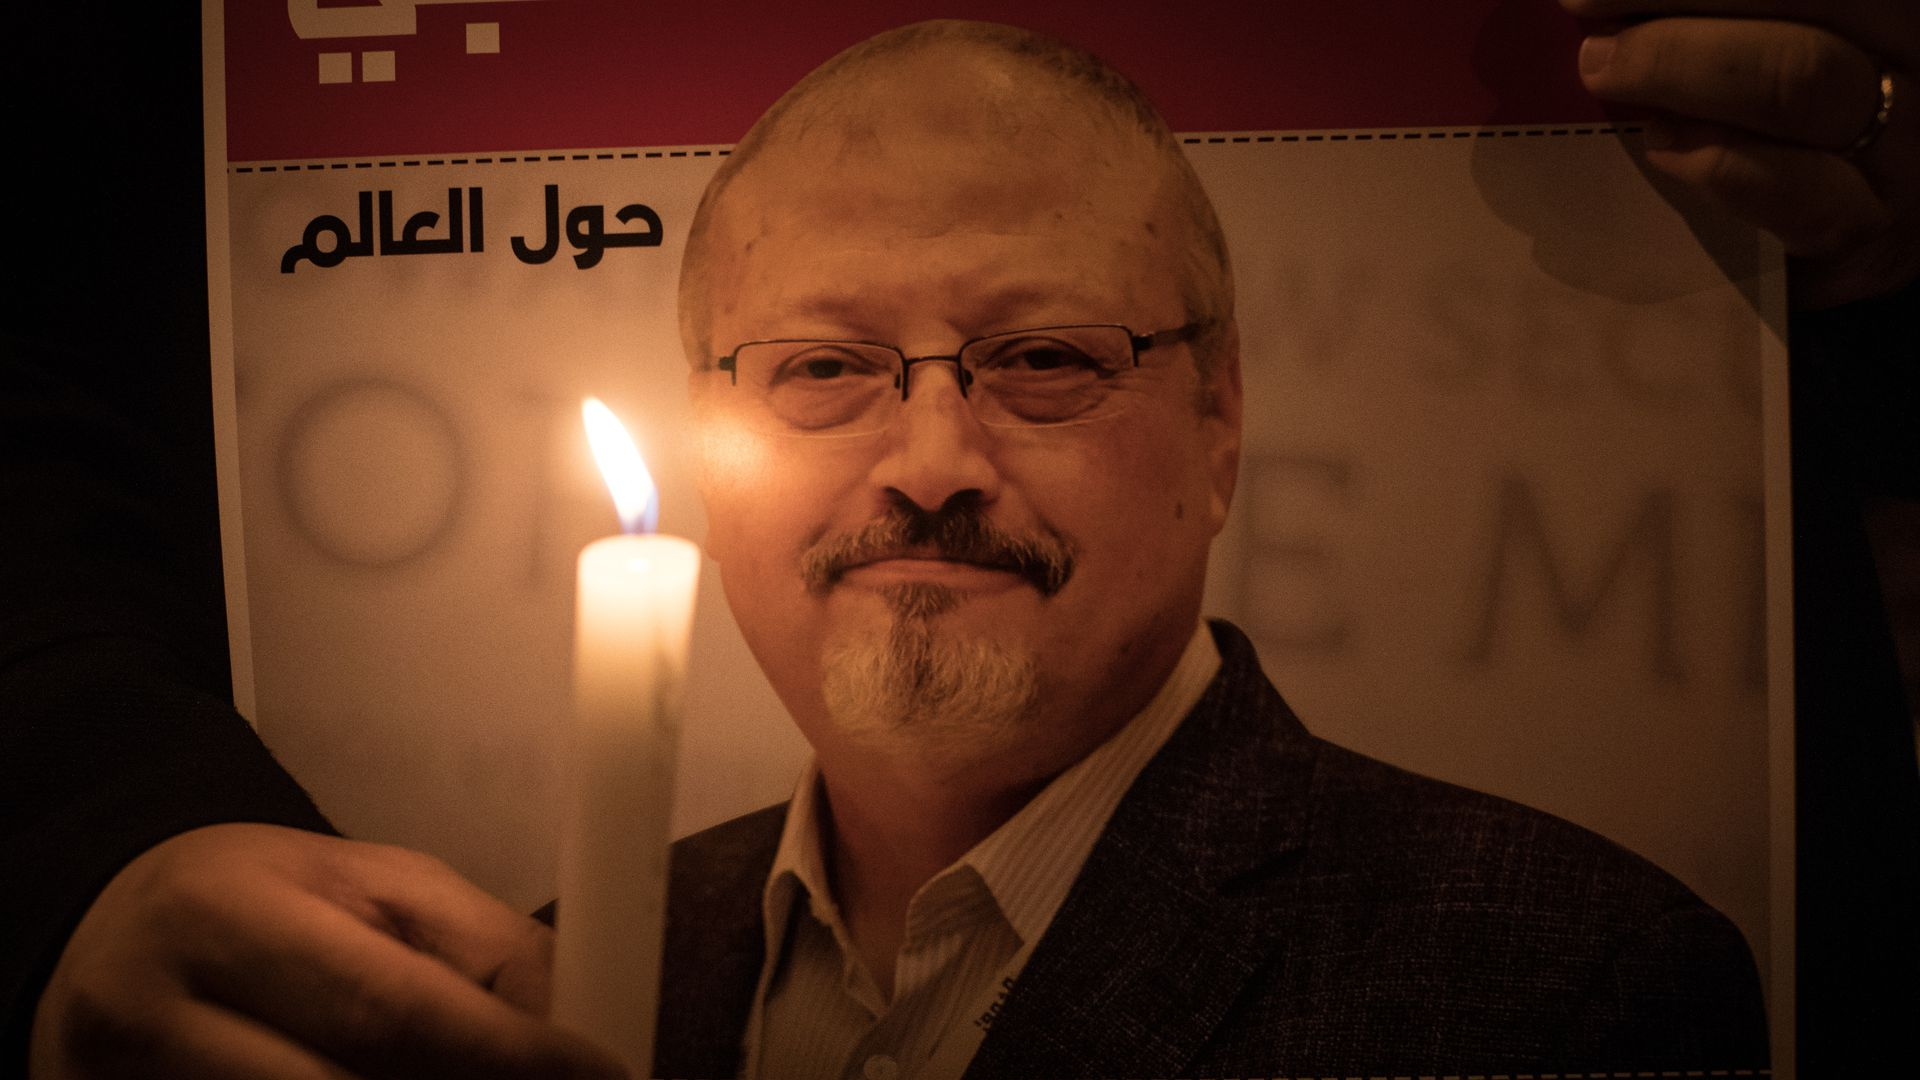 Photo of slain journalist Jamal Khashoggi at a memorial service